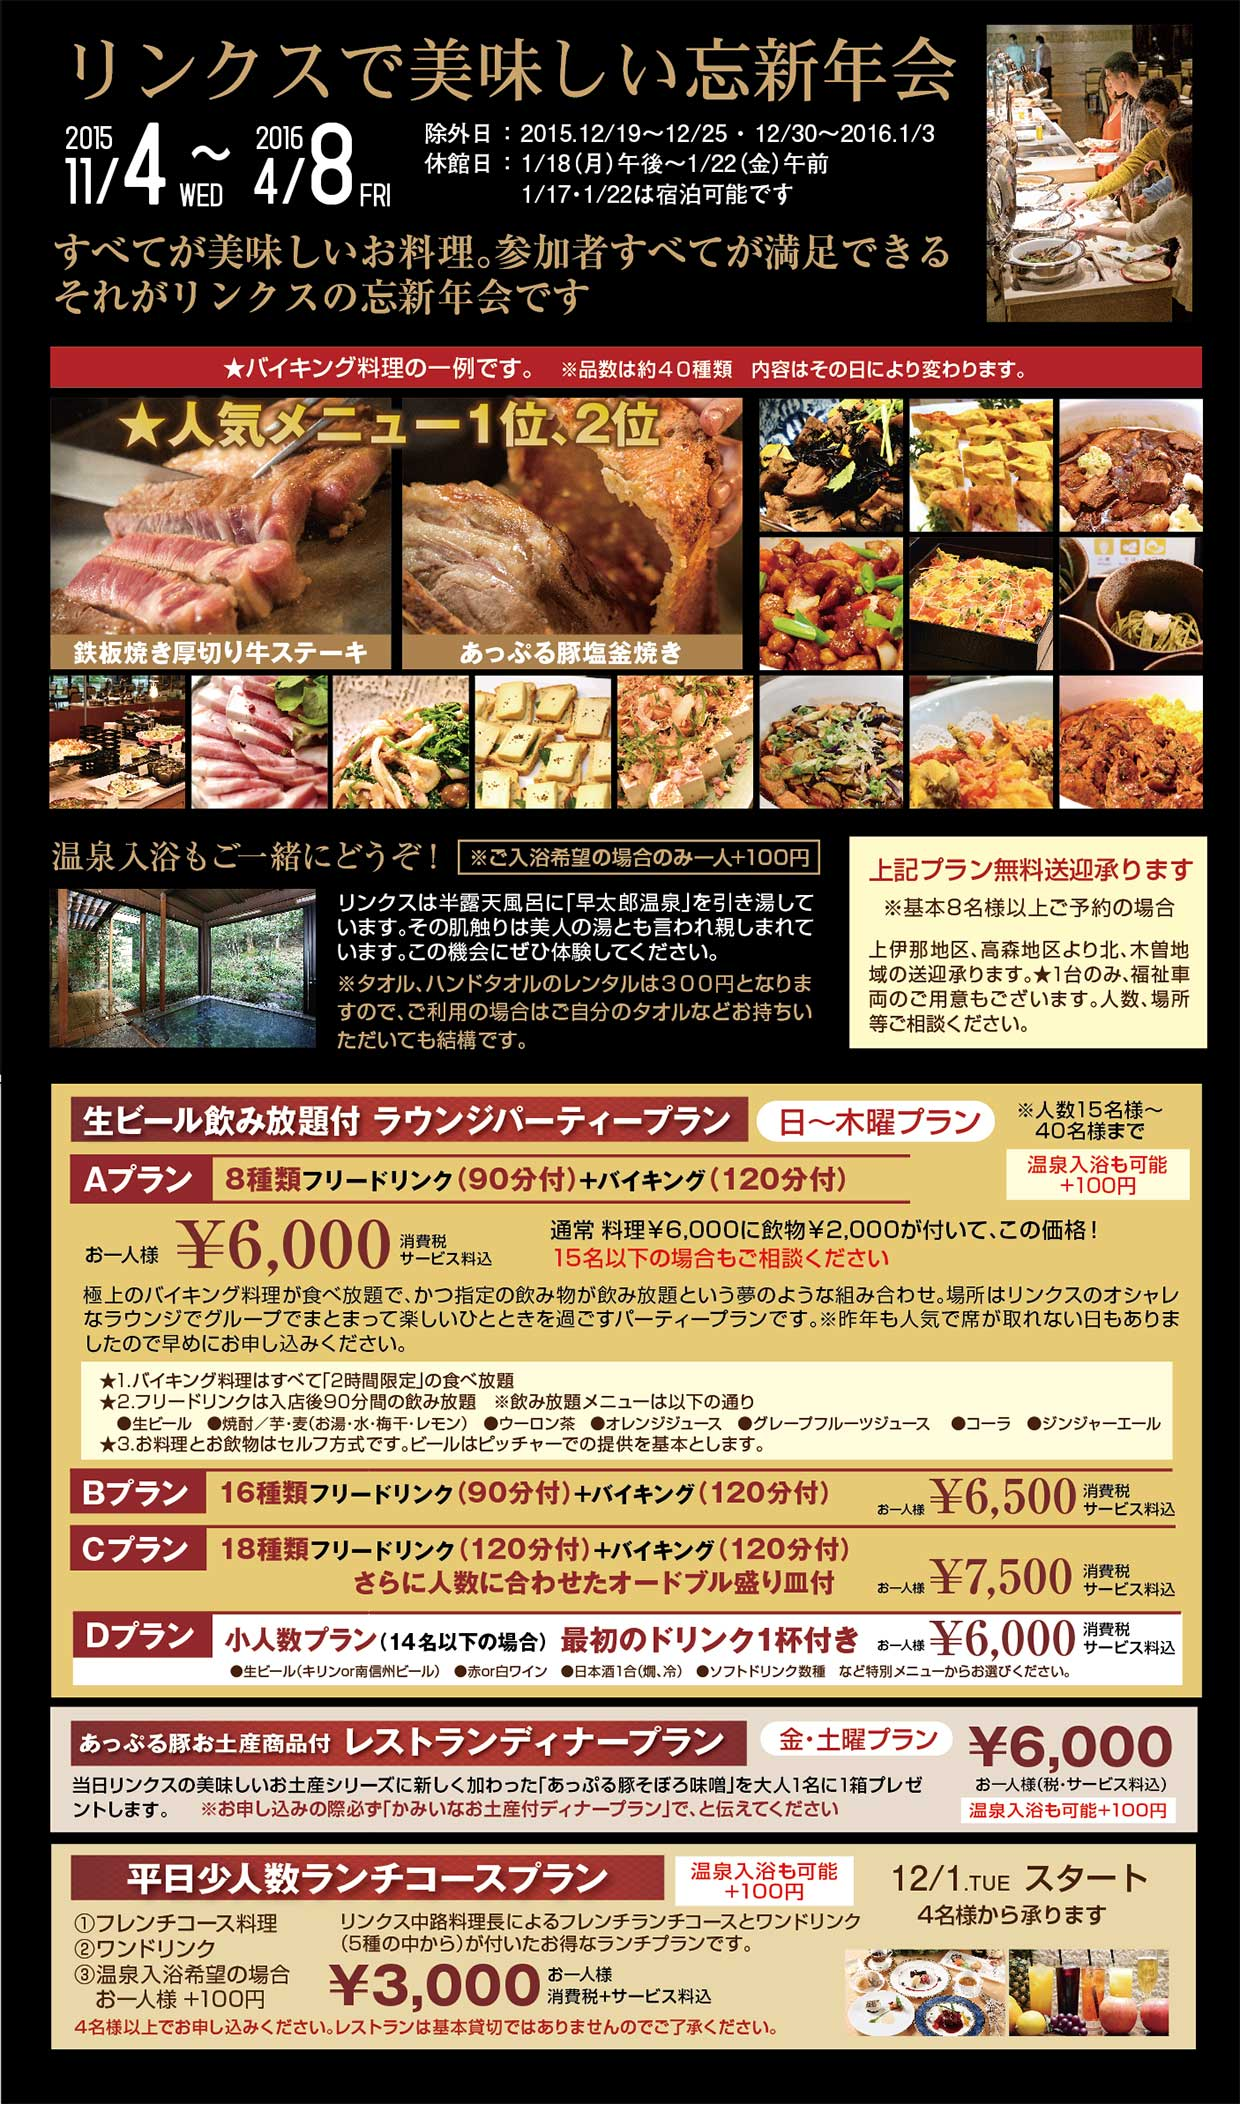 http://www.komagane-linx.co.jp/blogimages/kamiina201512-04.jpg